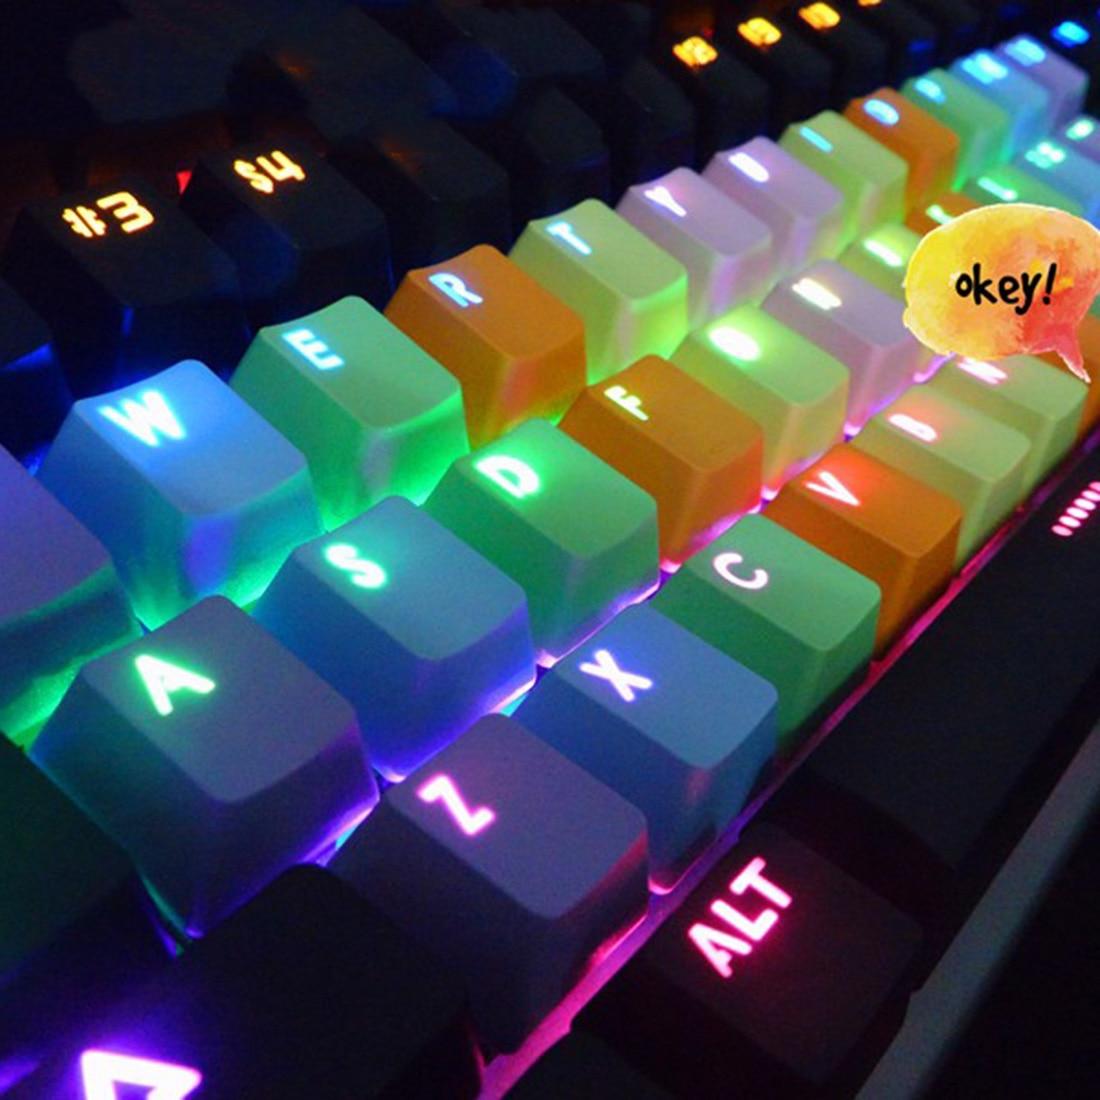 NOYOKERE Backlight PBT 37keys Double S Translucidus Backlight Backlit Rainbow Keycaps for Mechanical Keyboard футболка backlight backlight ba076emcbvs4